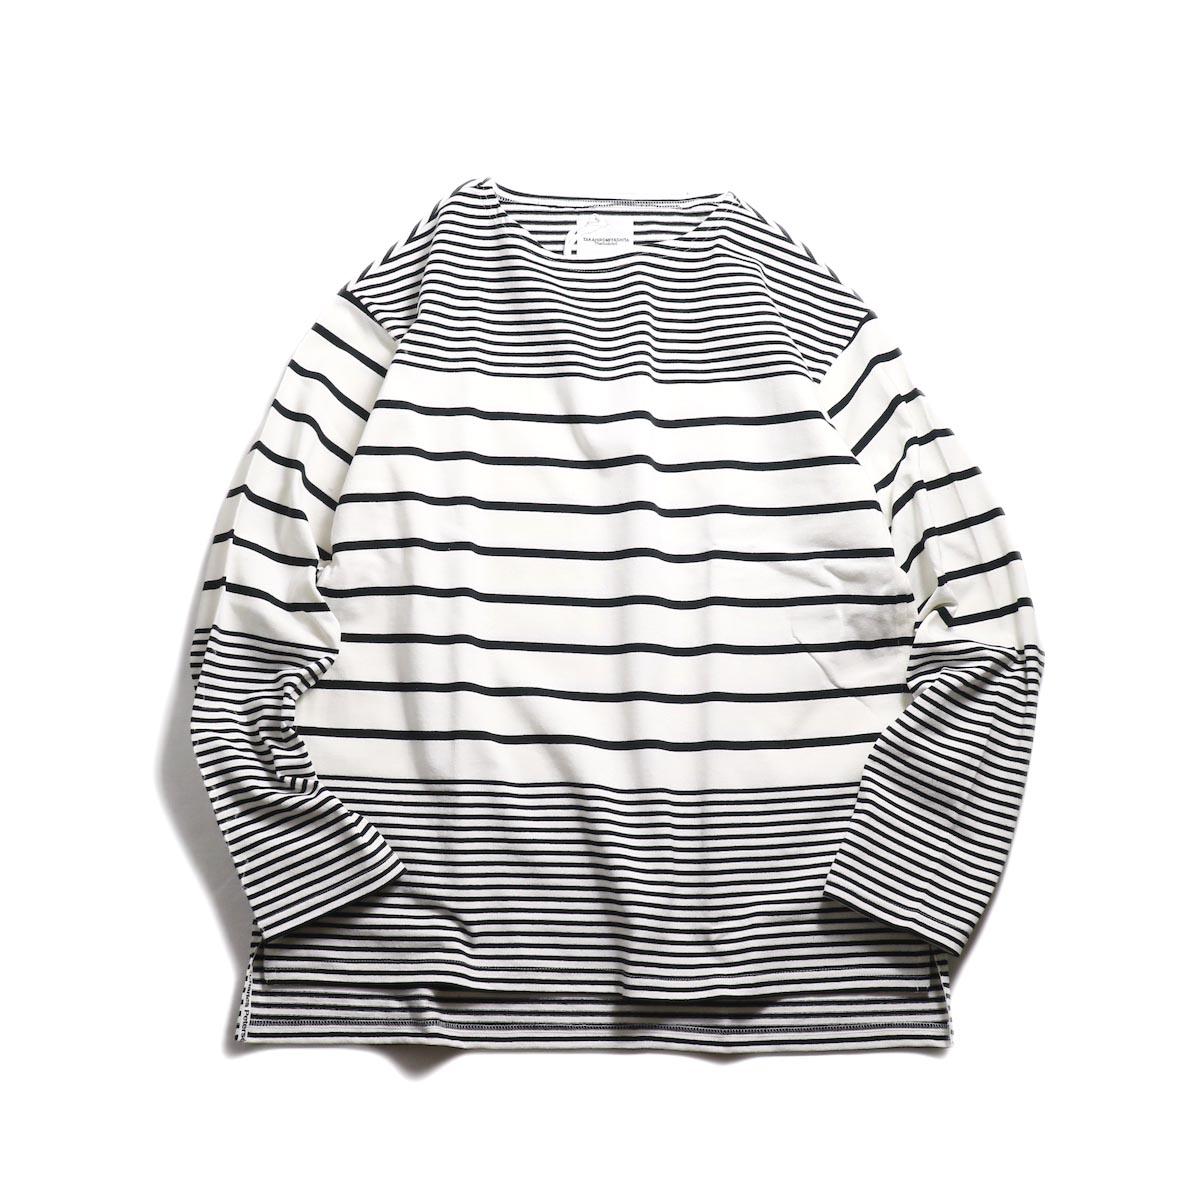 The Soloist / sc.0010bSS19 jimmy stripe oversized boat neck shirt. -White×Black